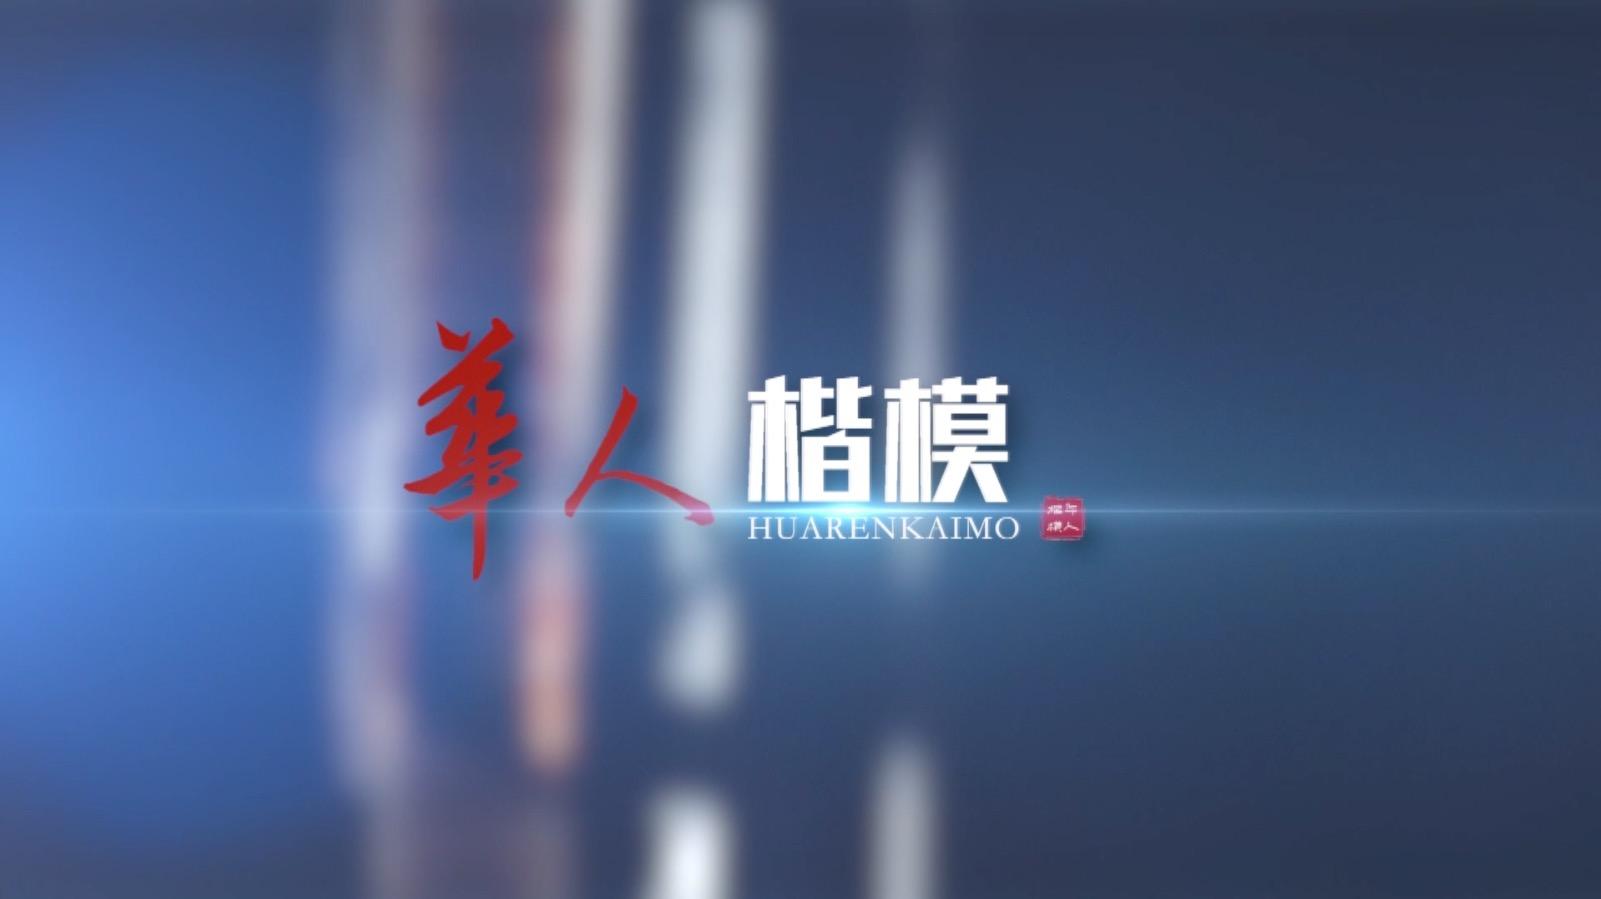 CCTV老故事频道华人楷模栏目